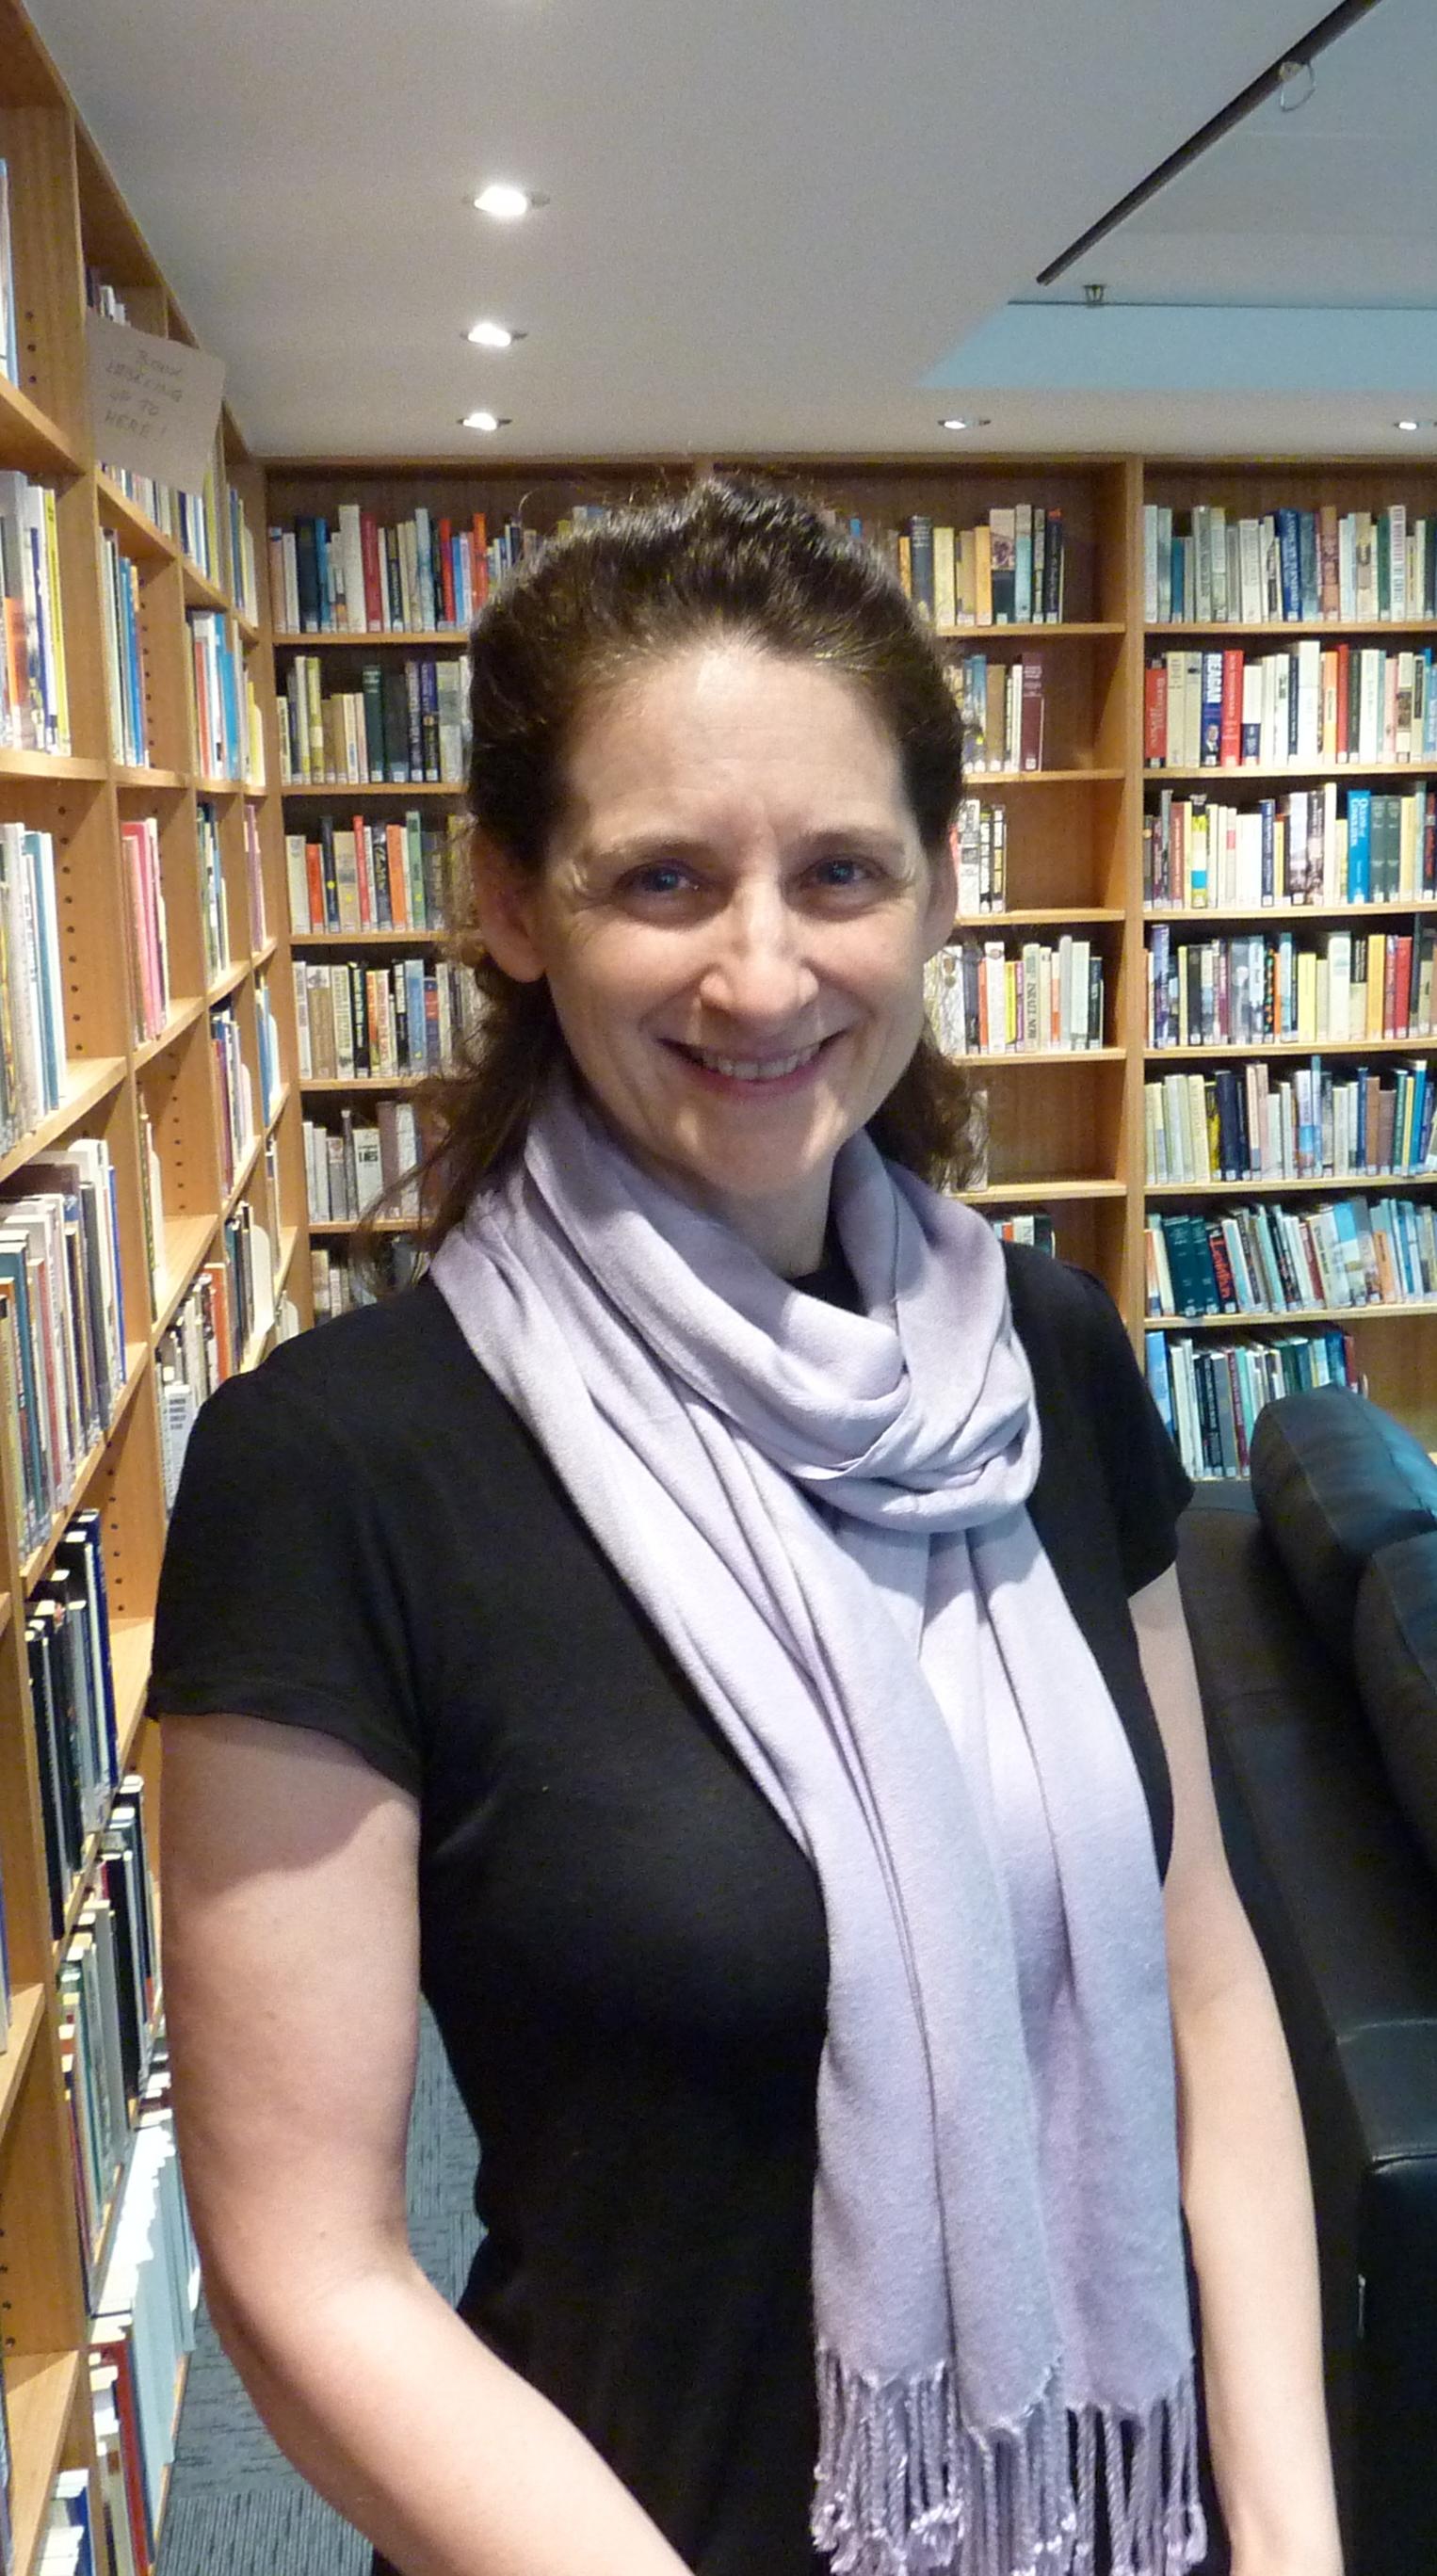 Walter's live blogging – Helen O'Neill